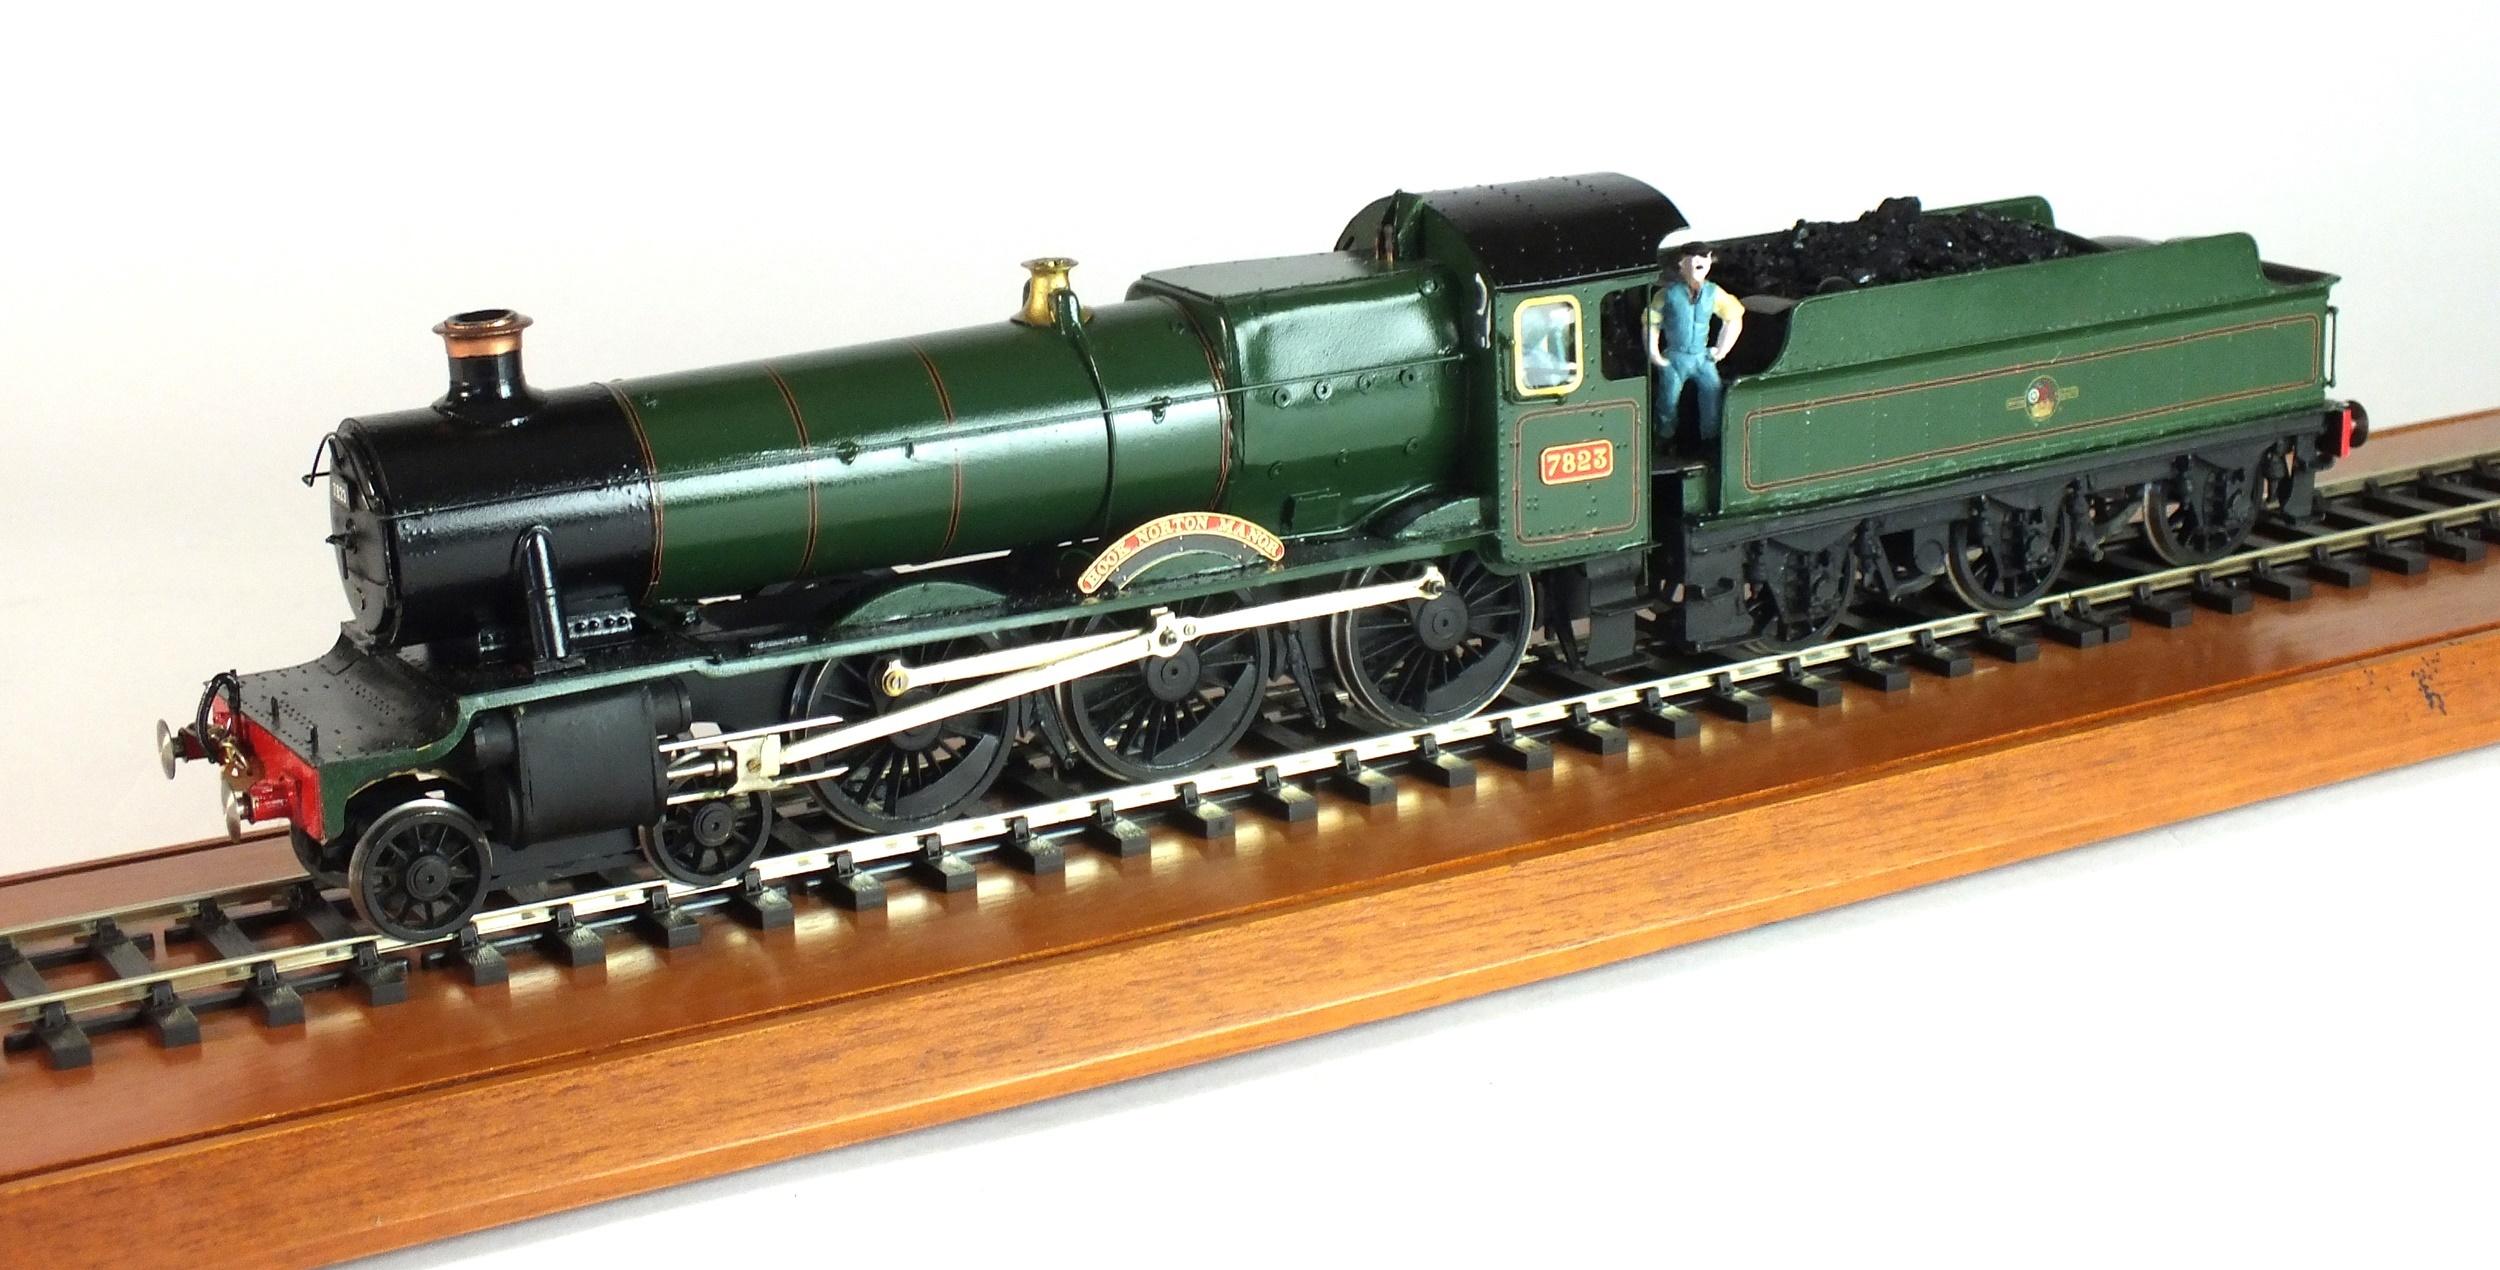 122 Railway collection Halls Fine Art